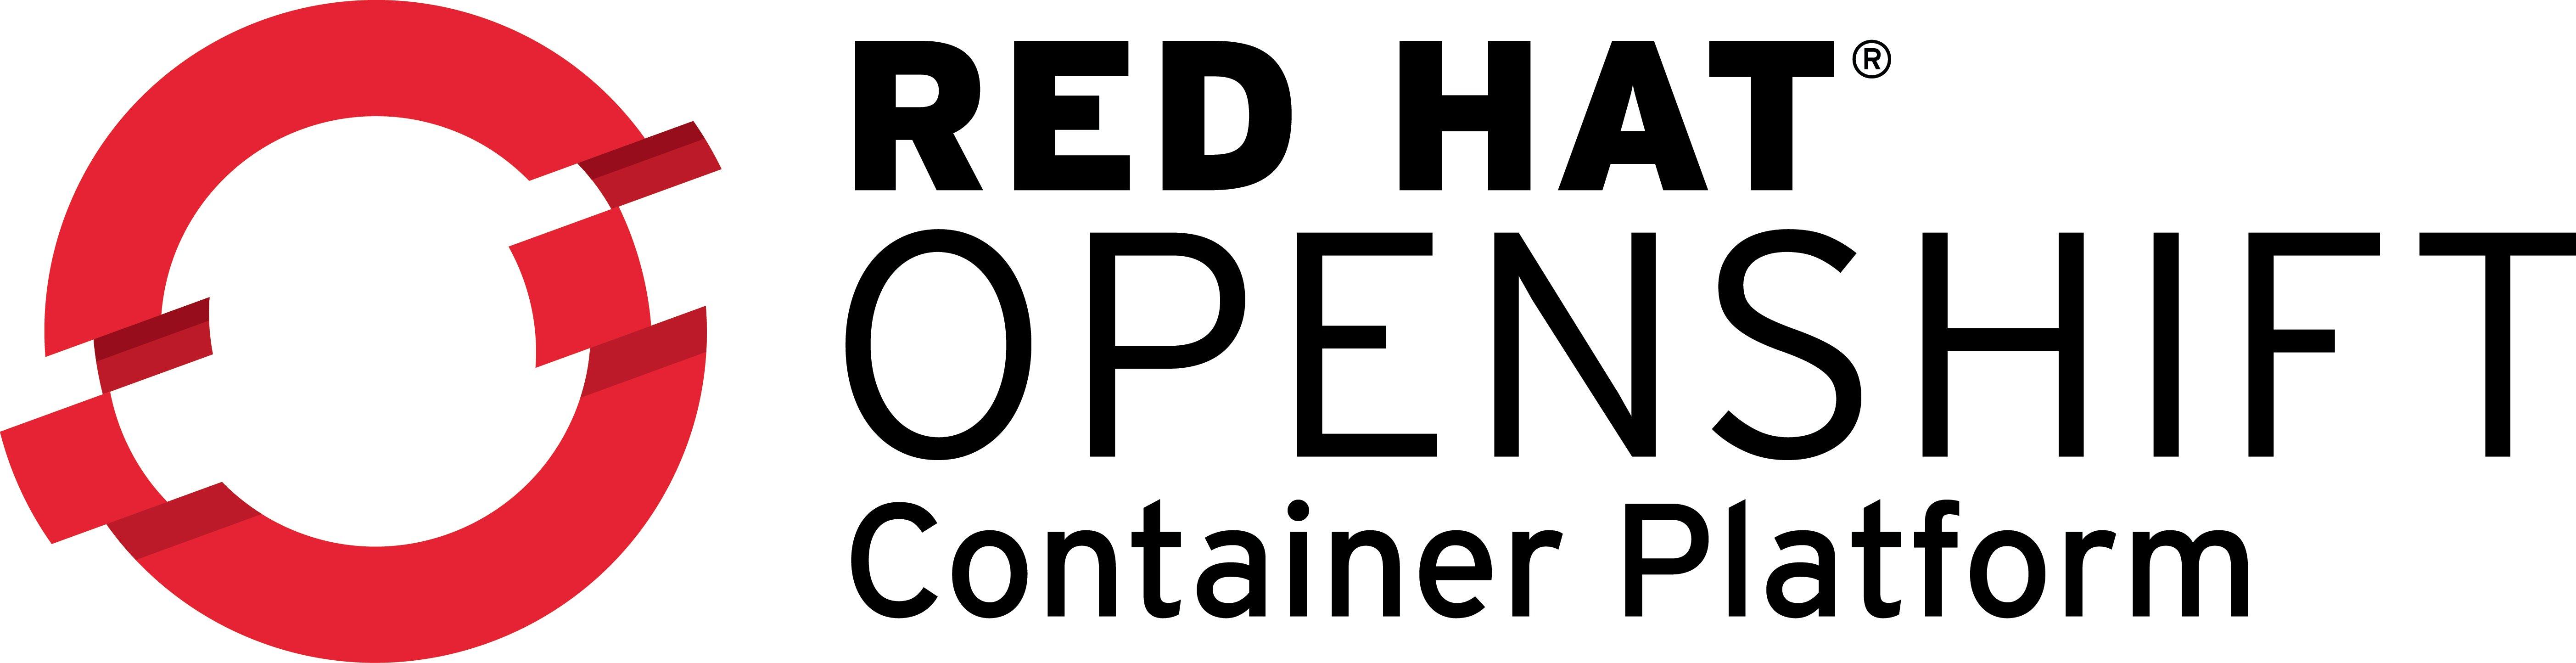 Logotype_RH_OpenShiftContainerPlatform_wLogo_CMYK_Black